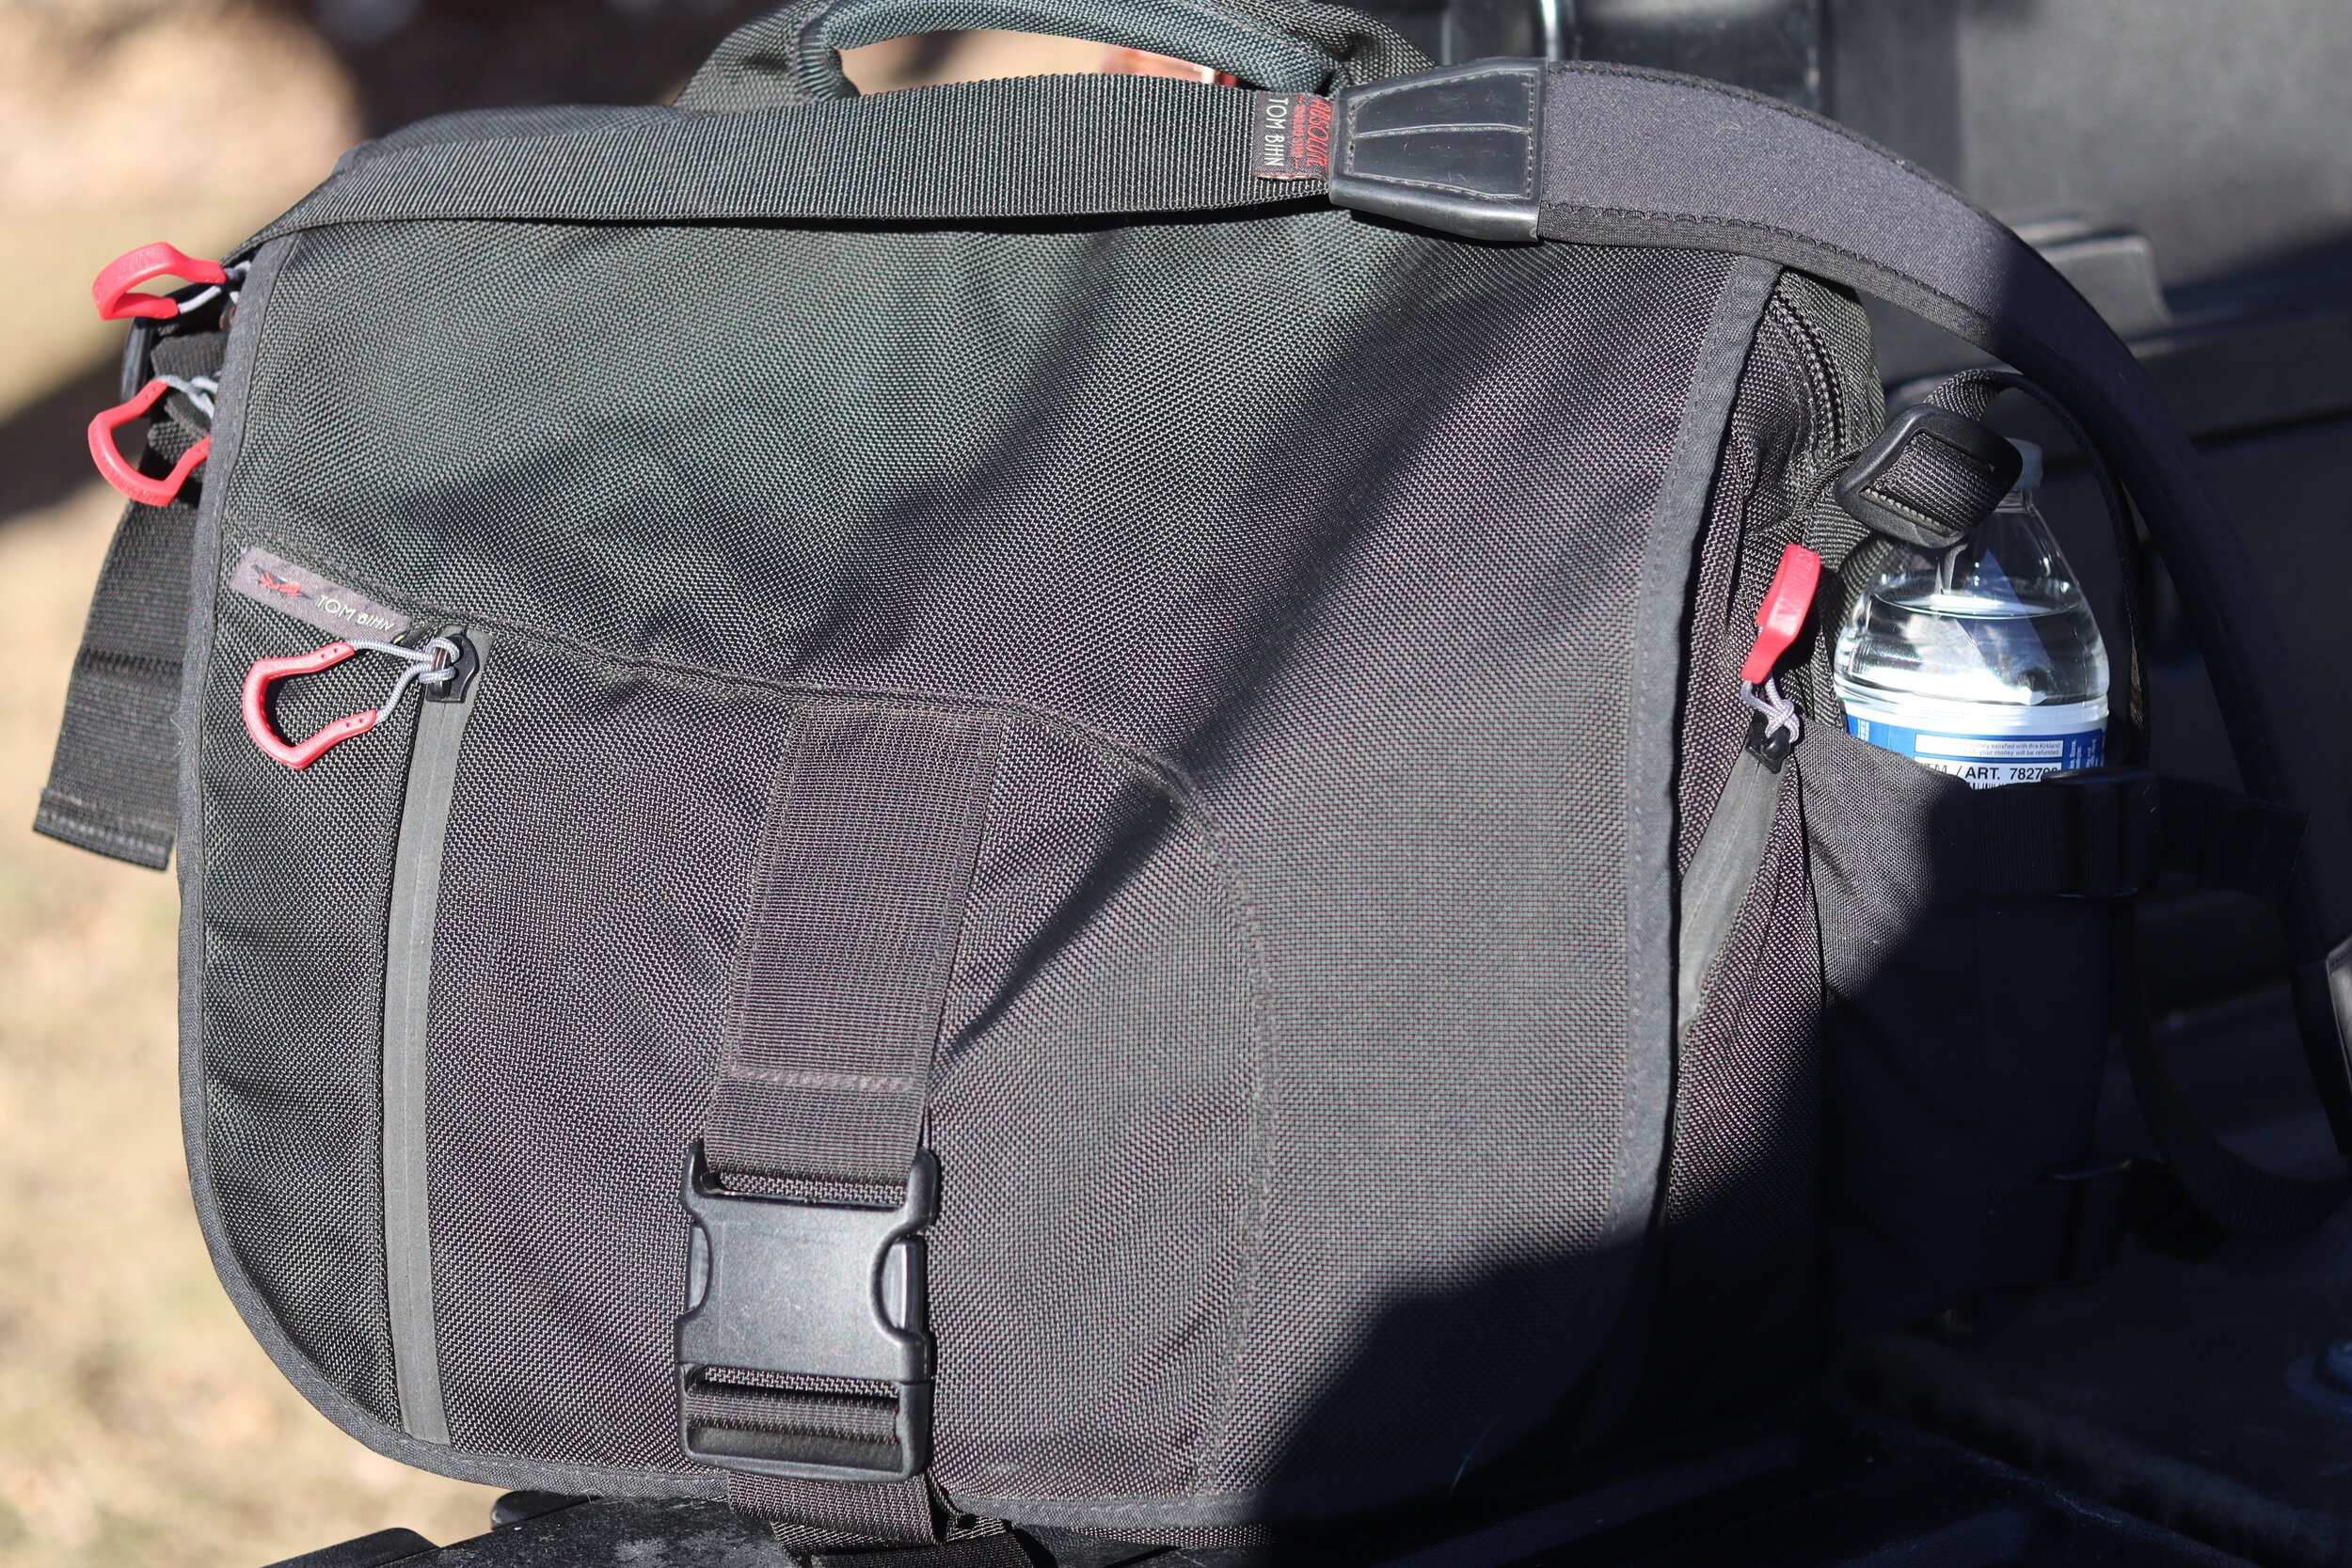 Tom Bihn Id Messenger Bag Review Rmk